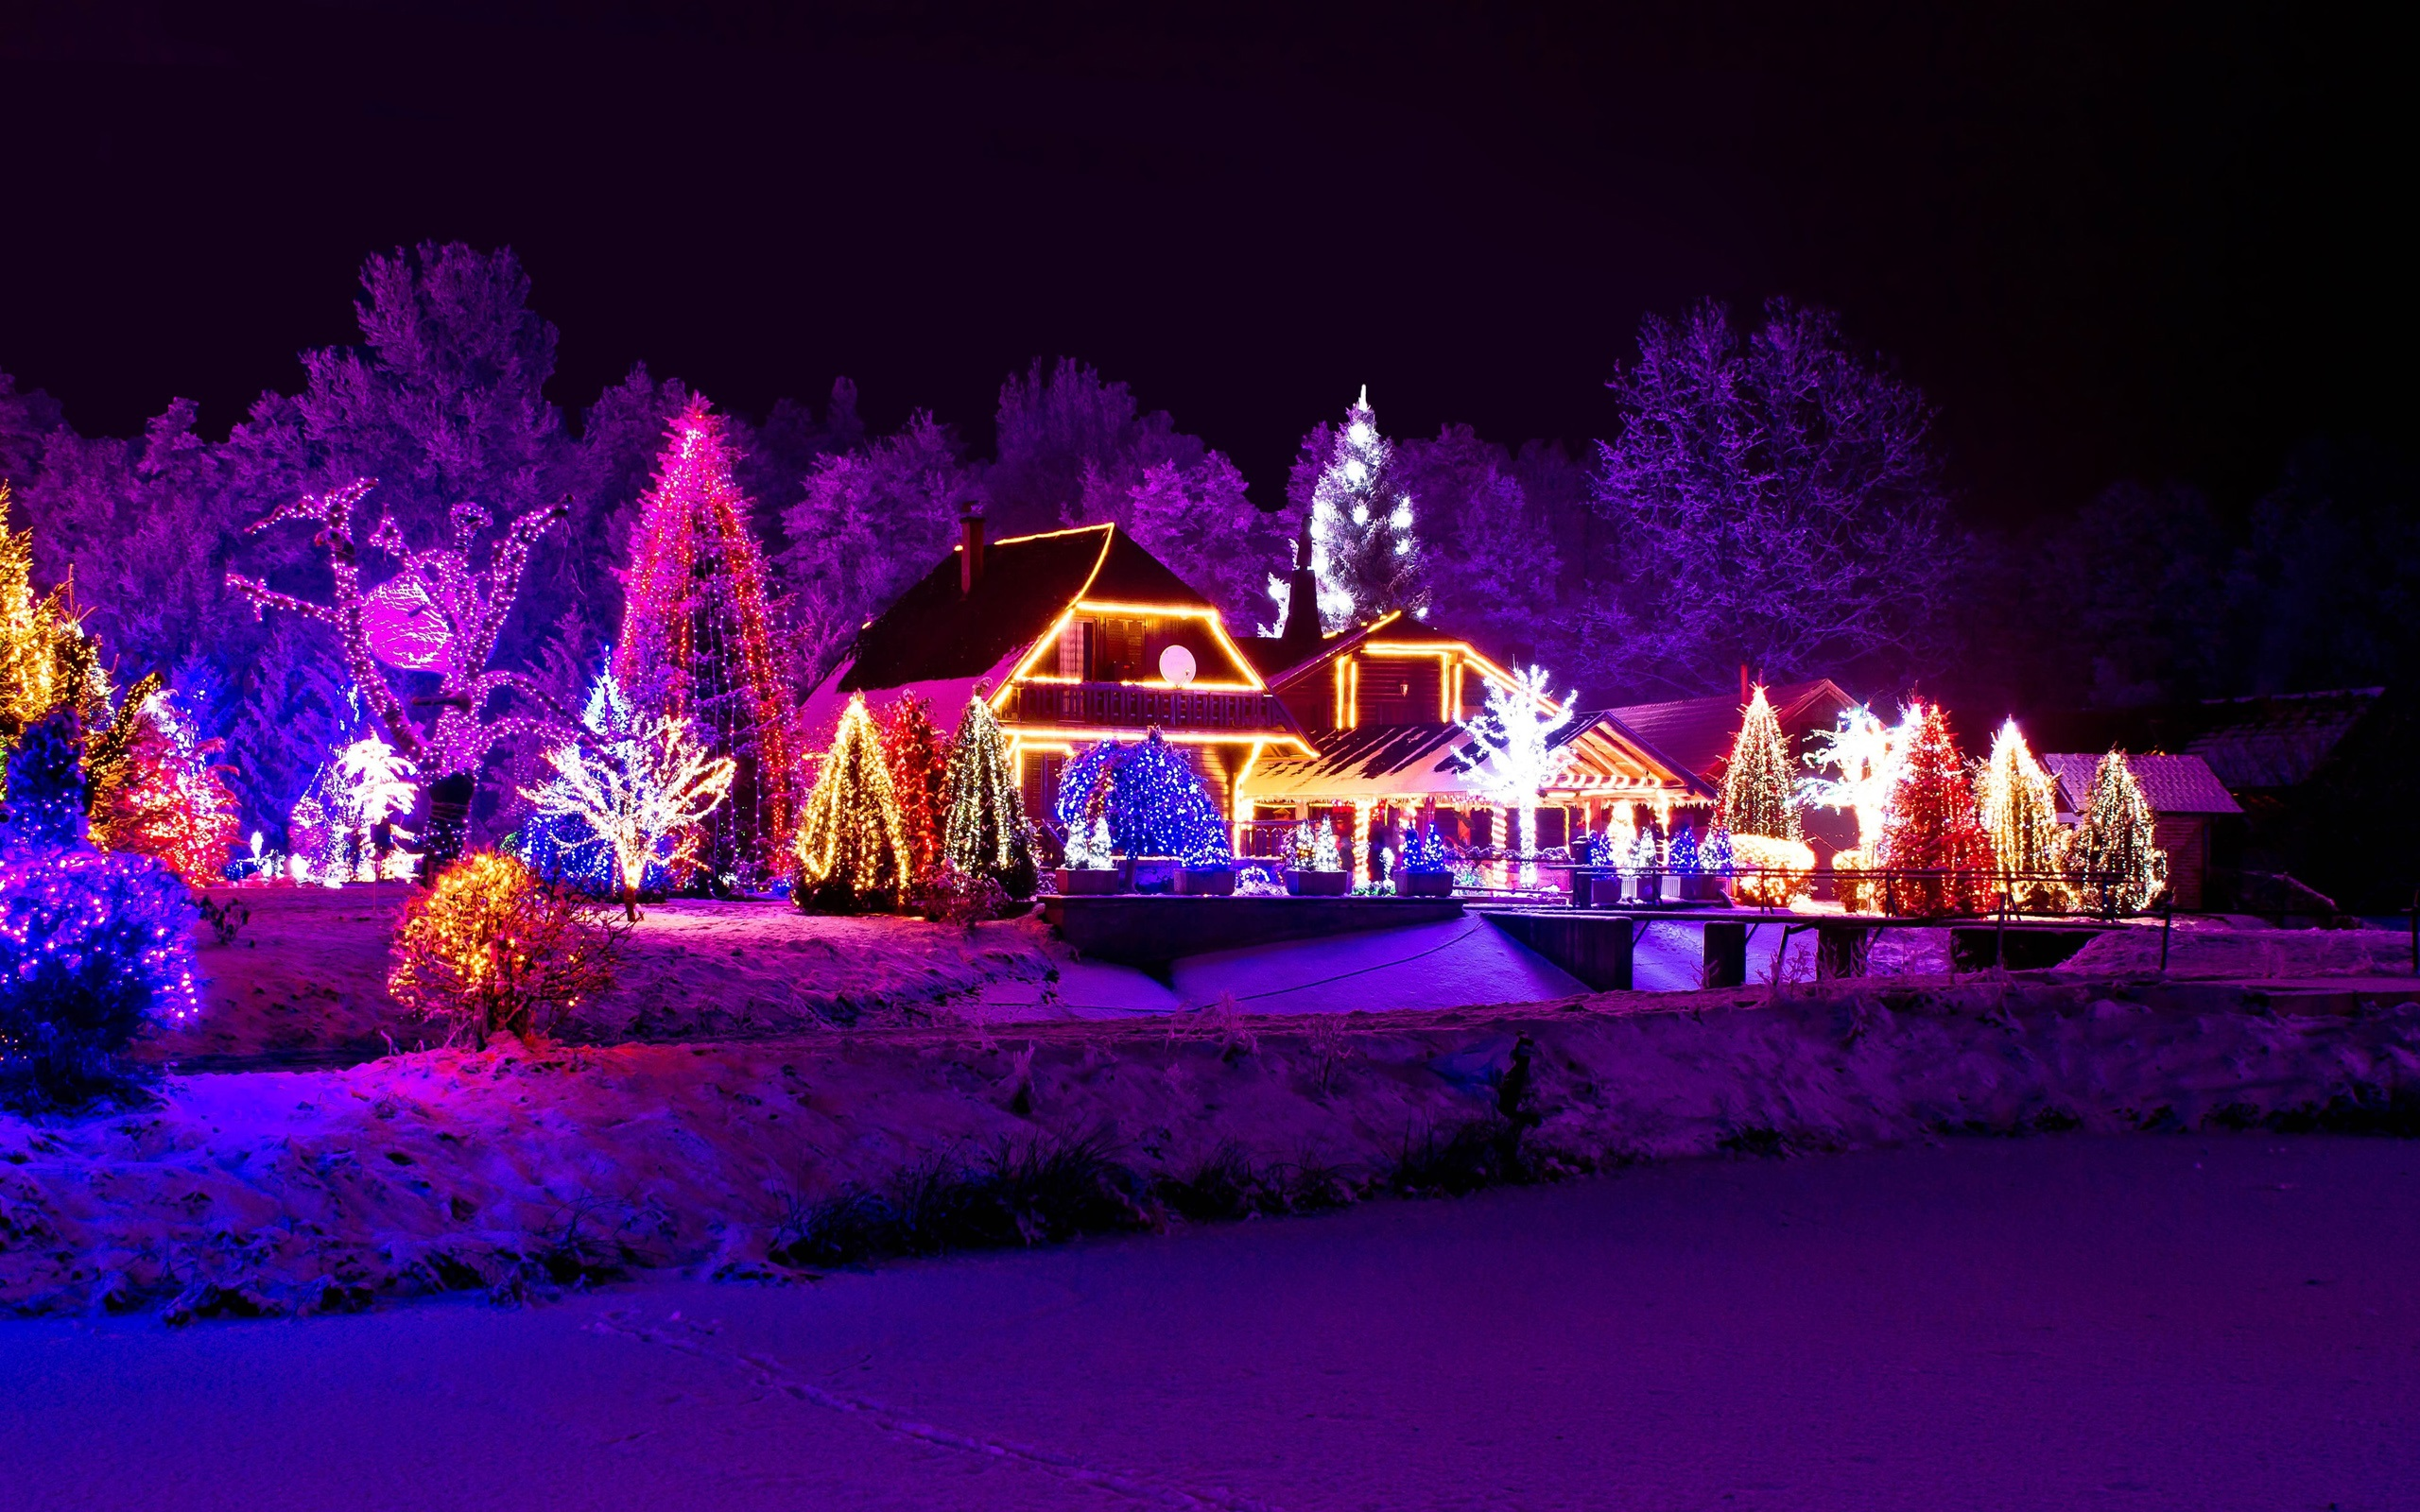 Wallpaper Winter, night, lights, new year, house, lake